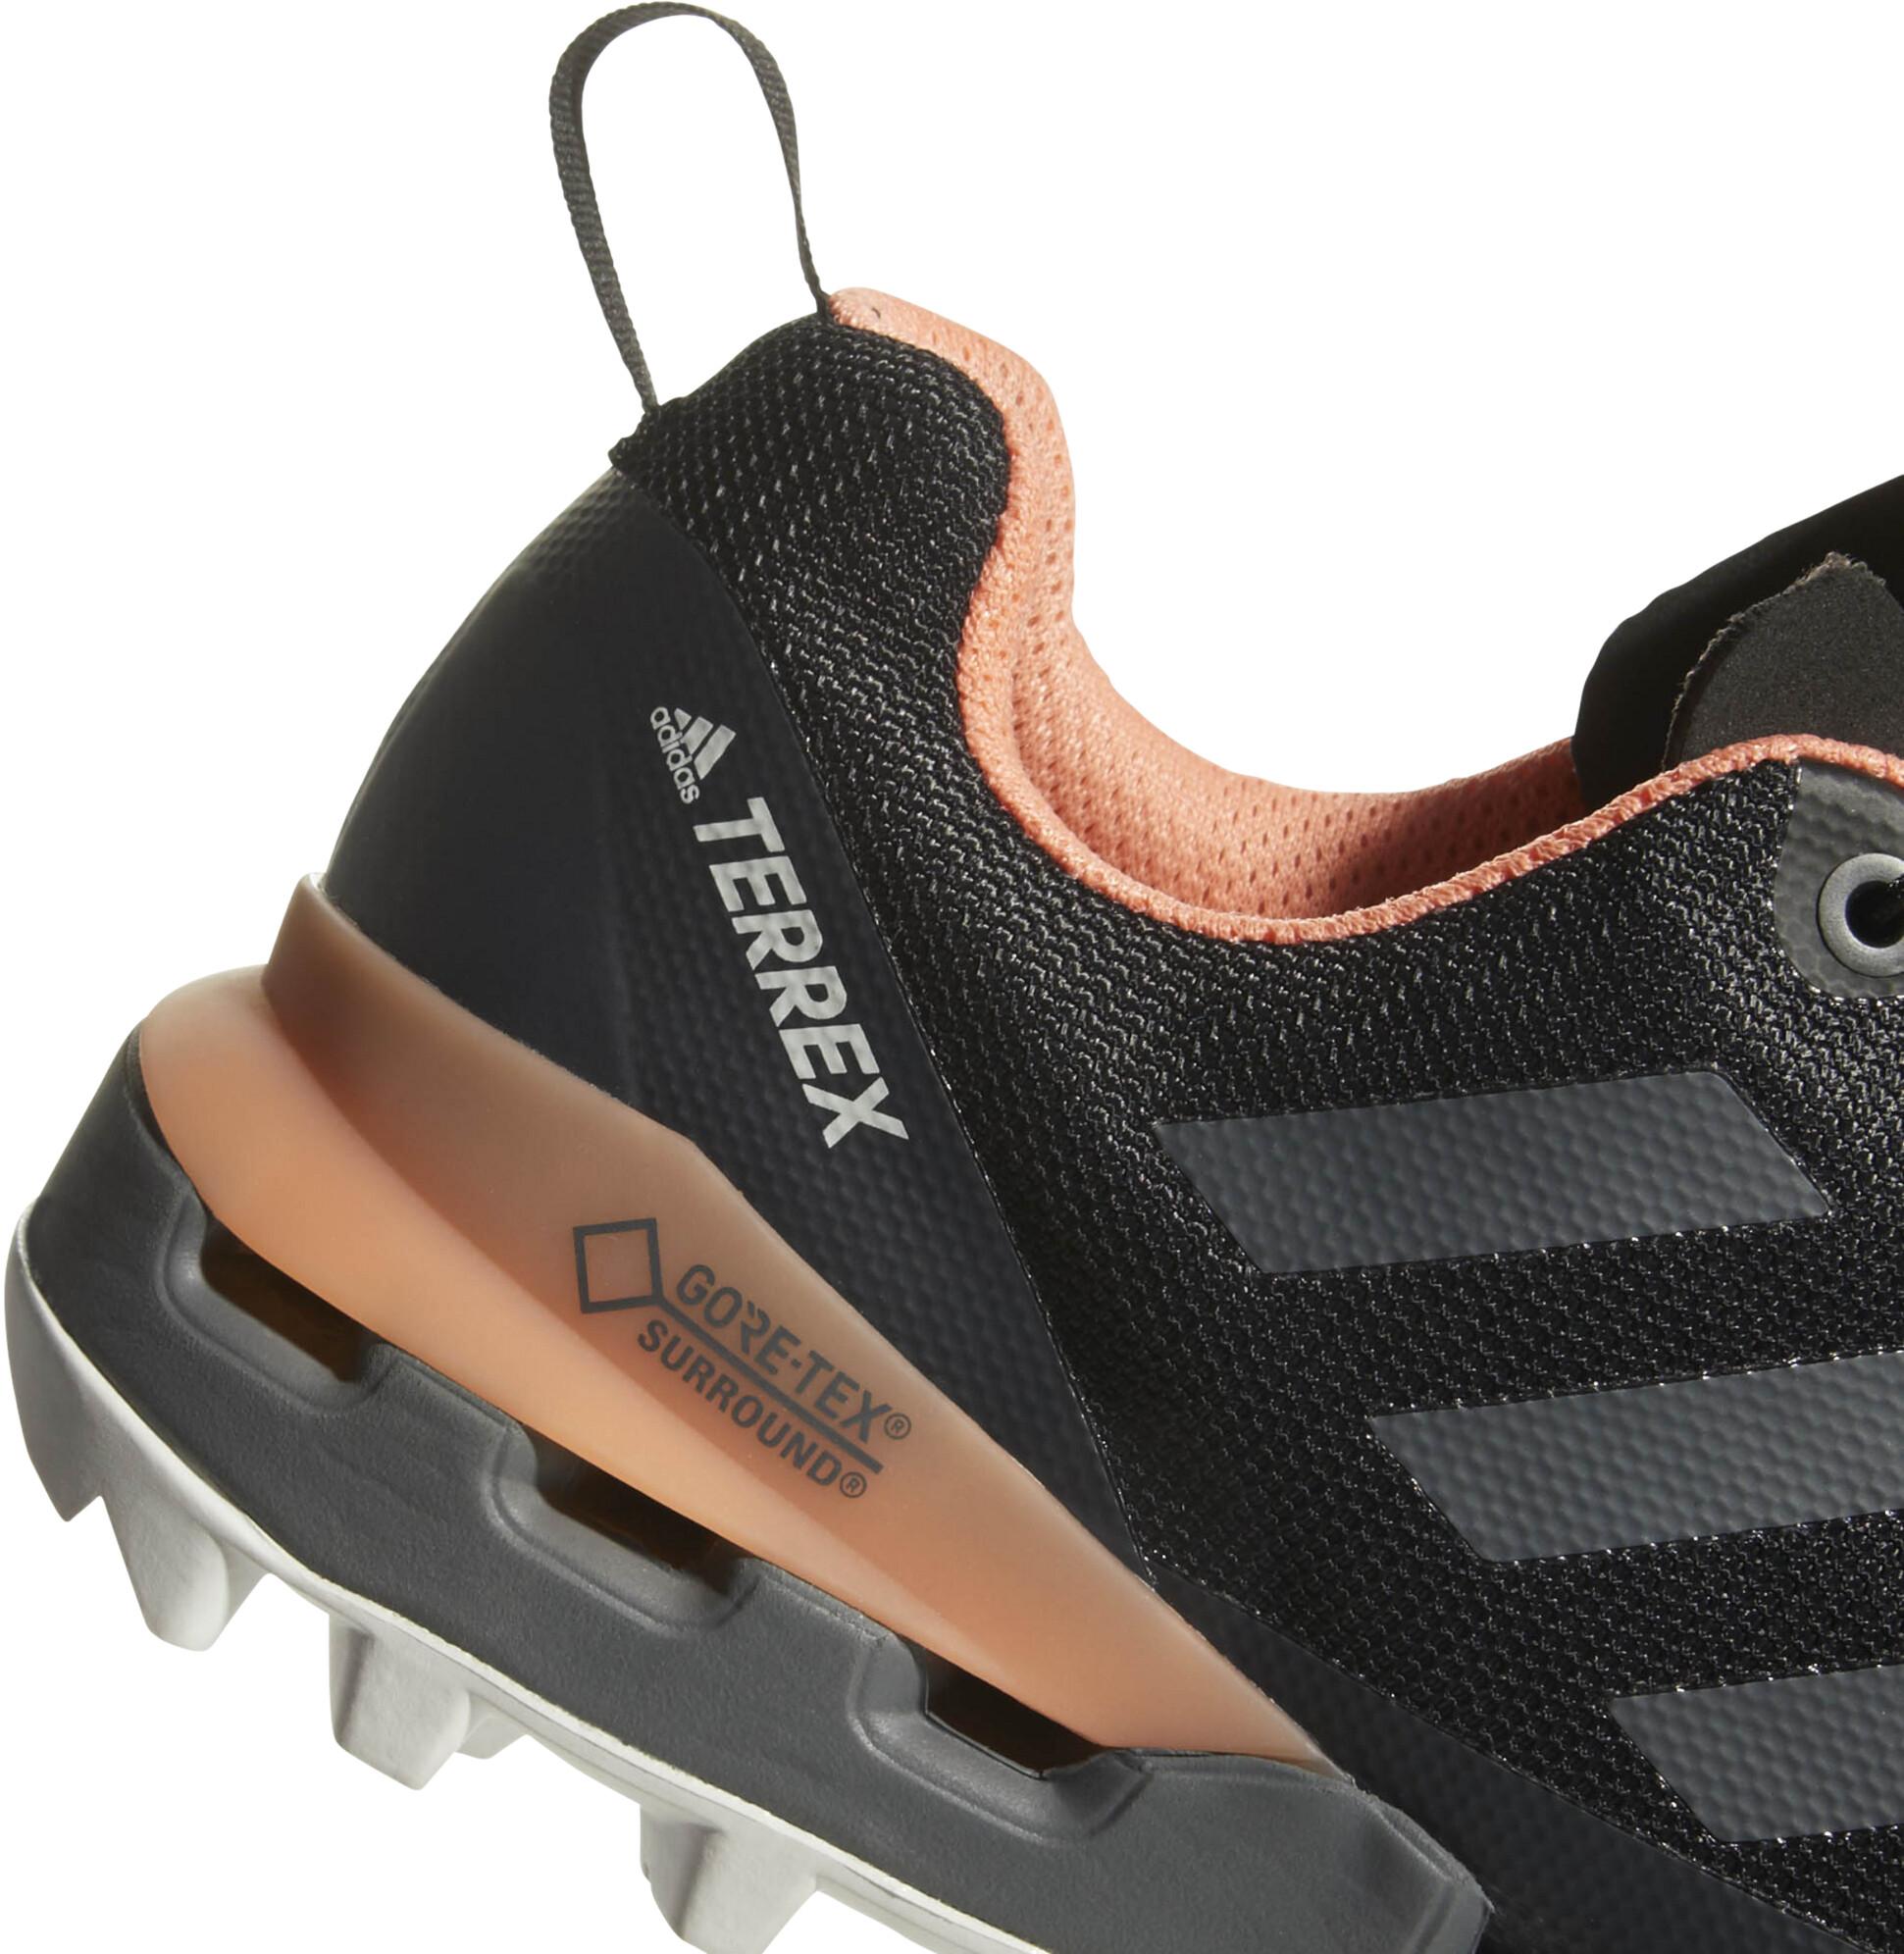 super popular cc7d8 60112 adidas TERREX Fast GTX-Surround - Zapatillas running Mujer - gris negro